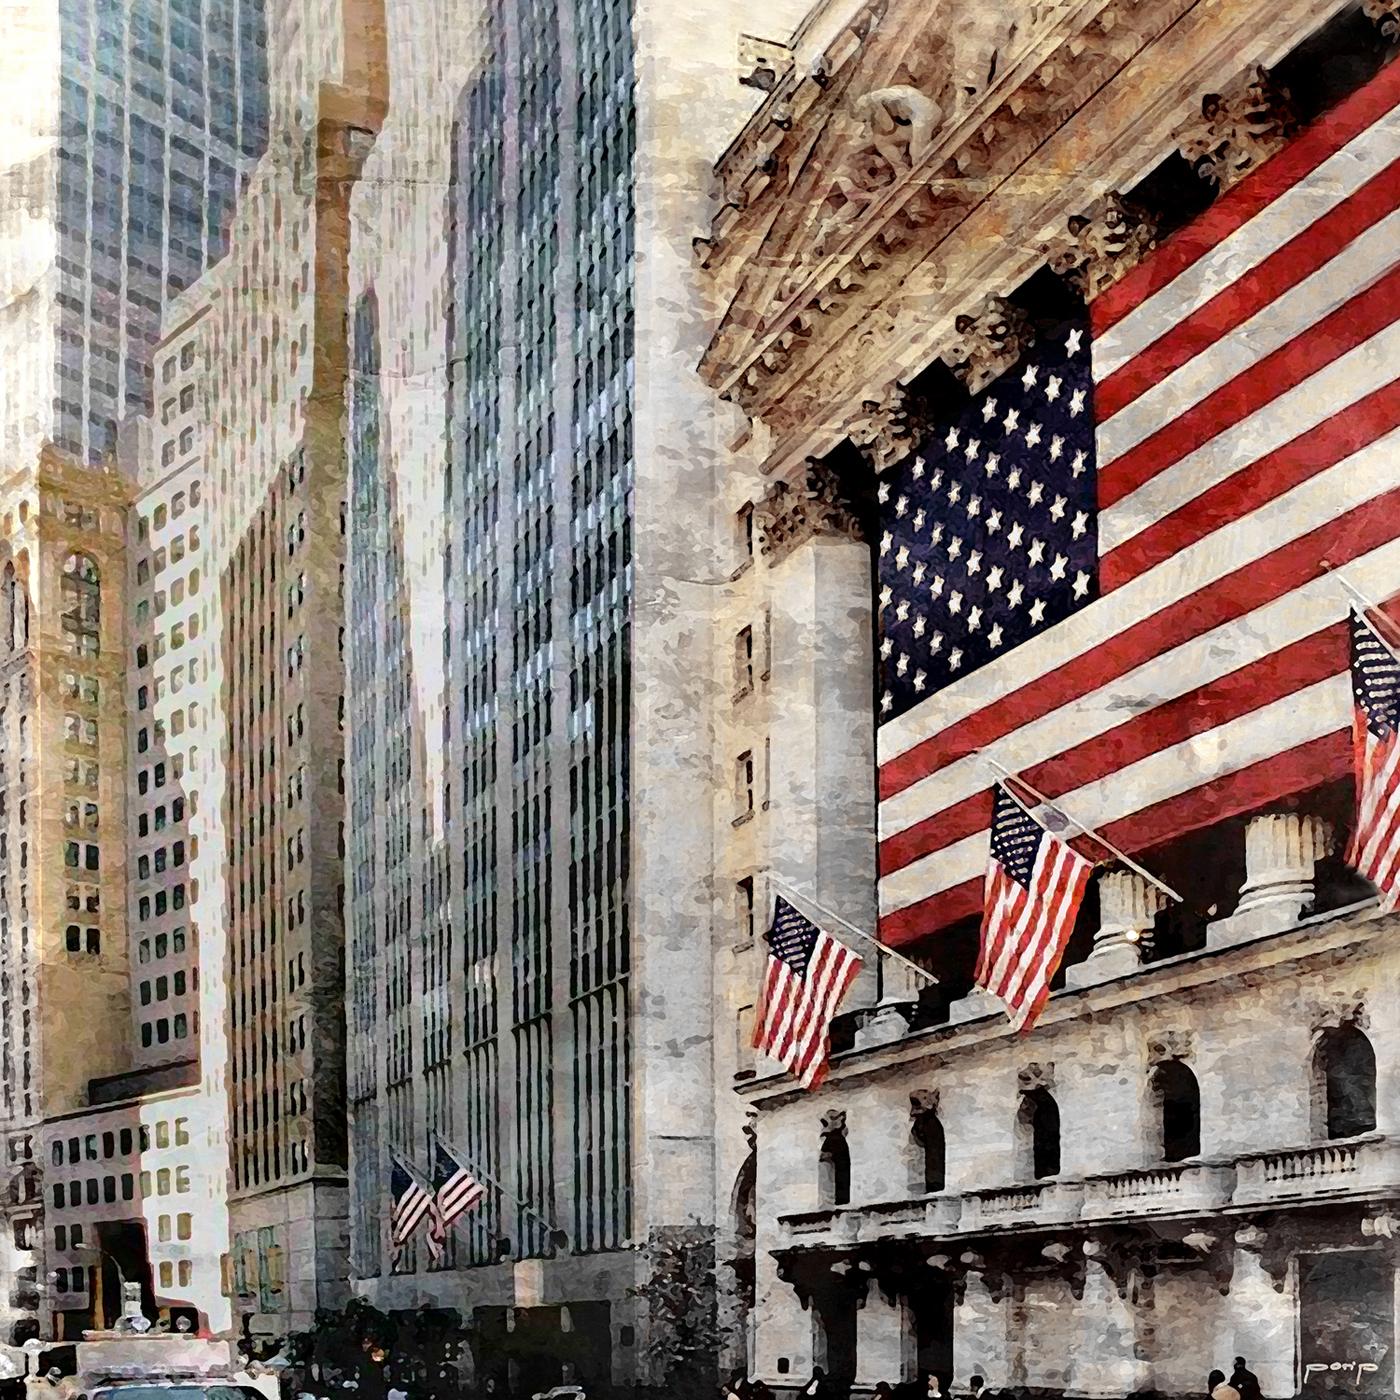 NYC-Wallstreet 3  –  70 x 70 cm